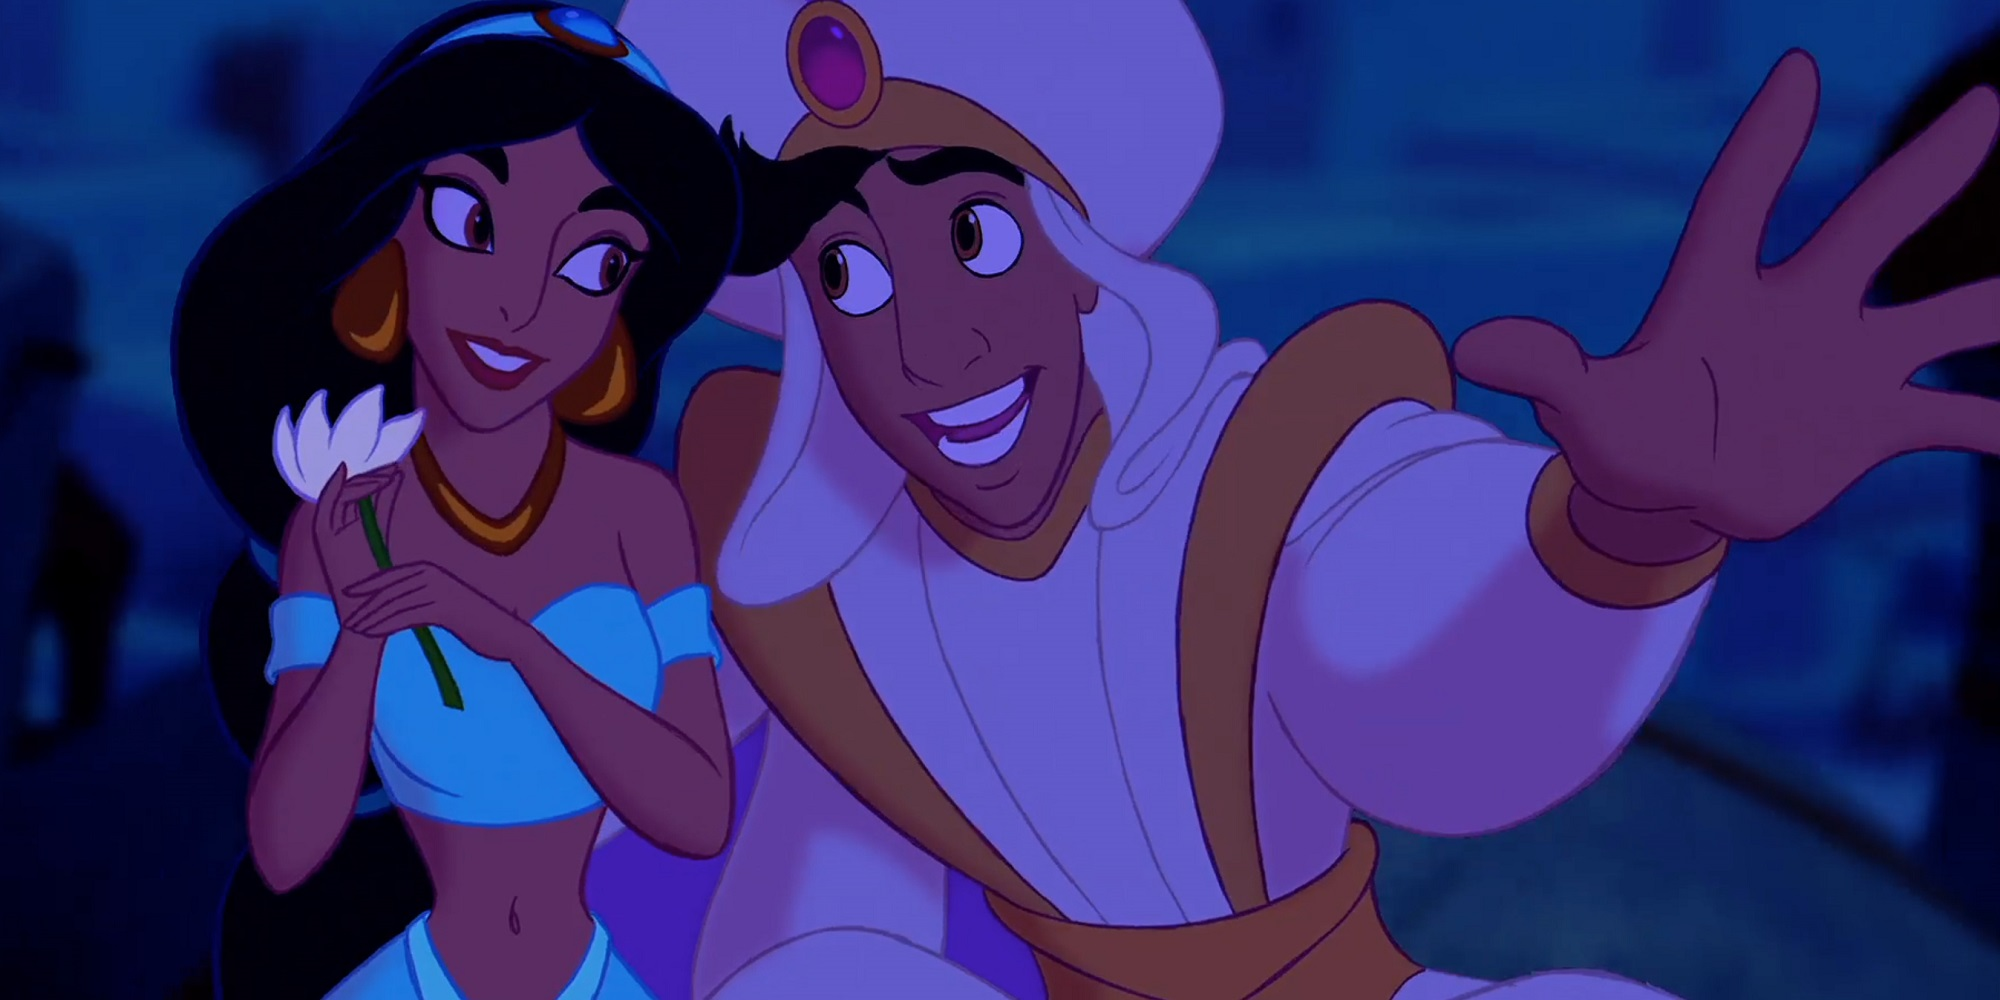 Aladdin and Jasmine on their magic carpet ride